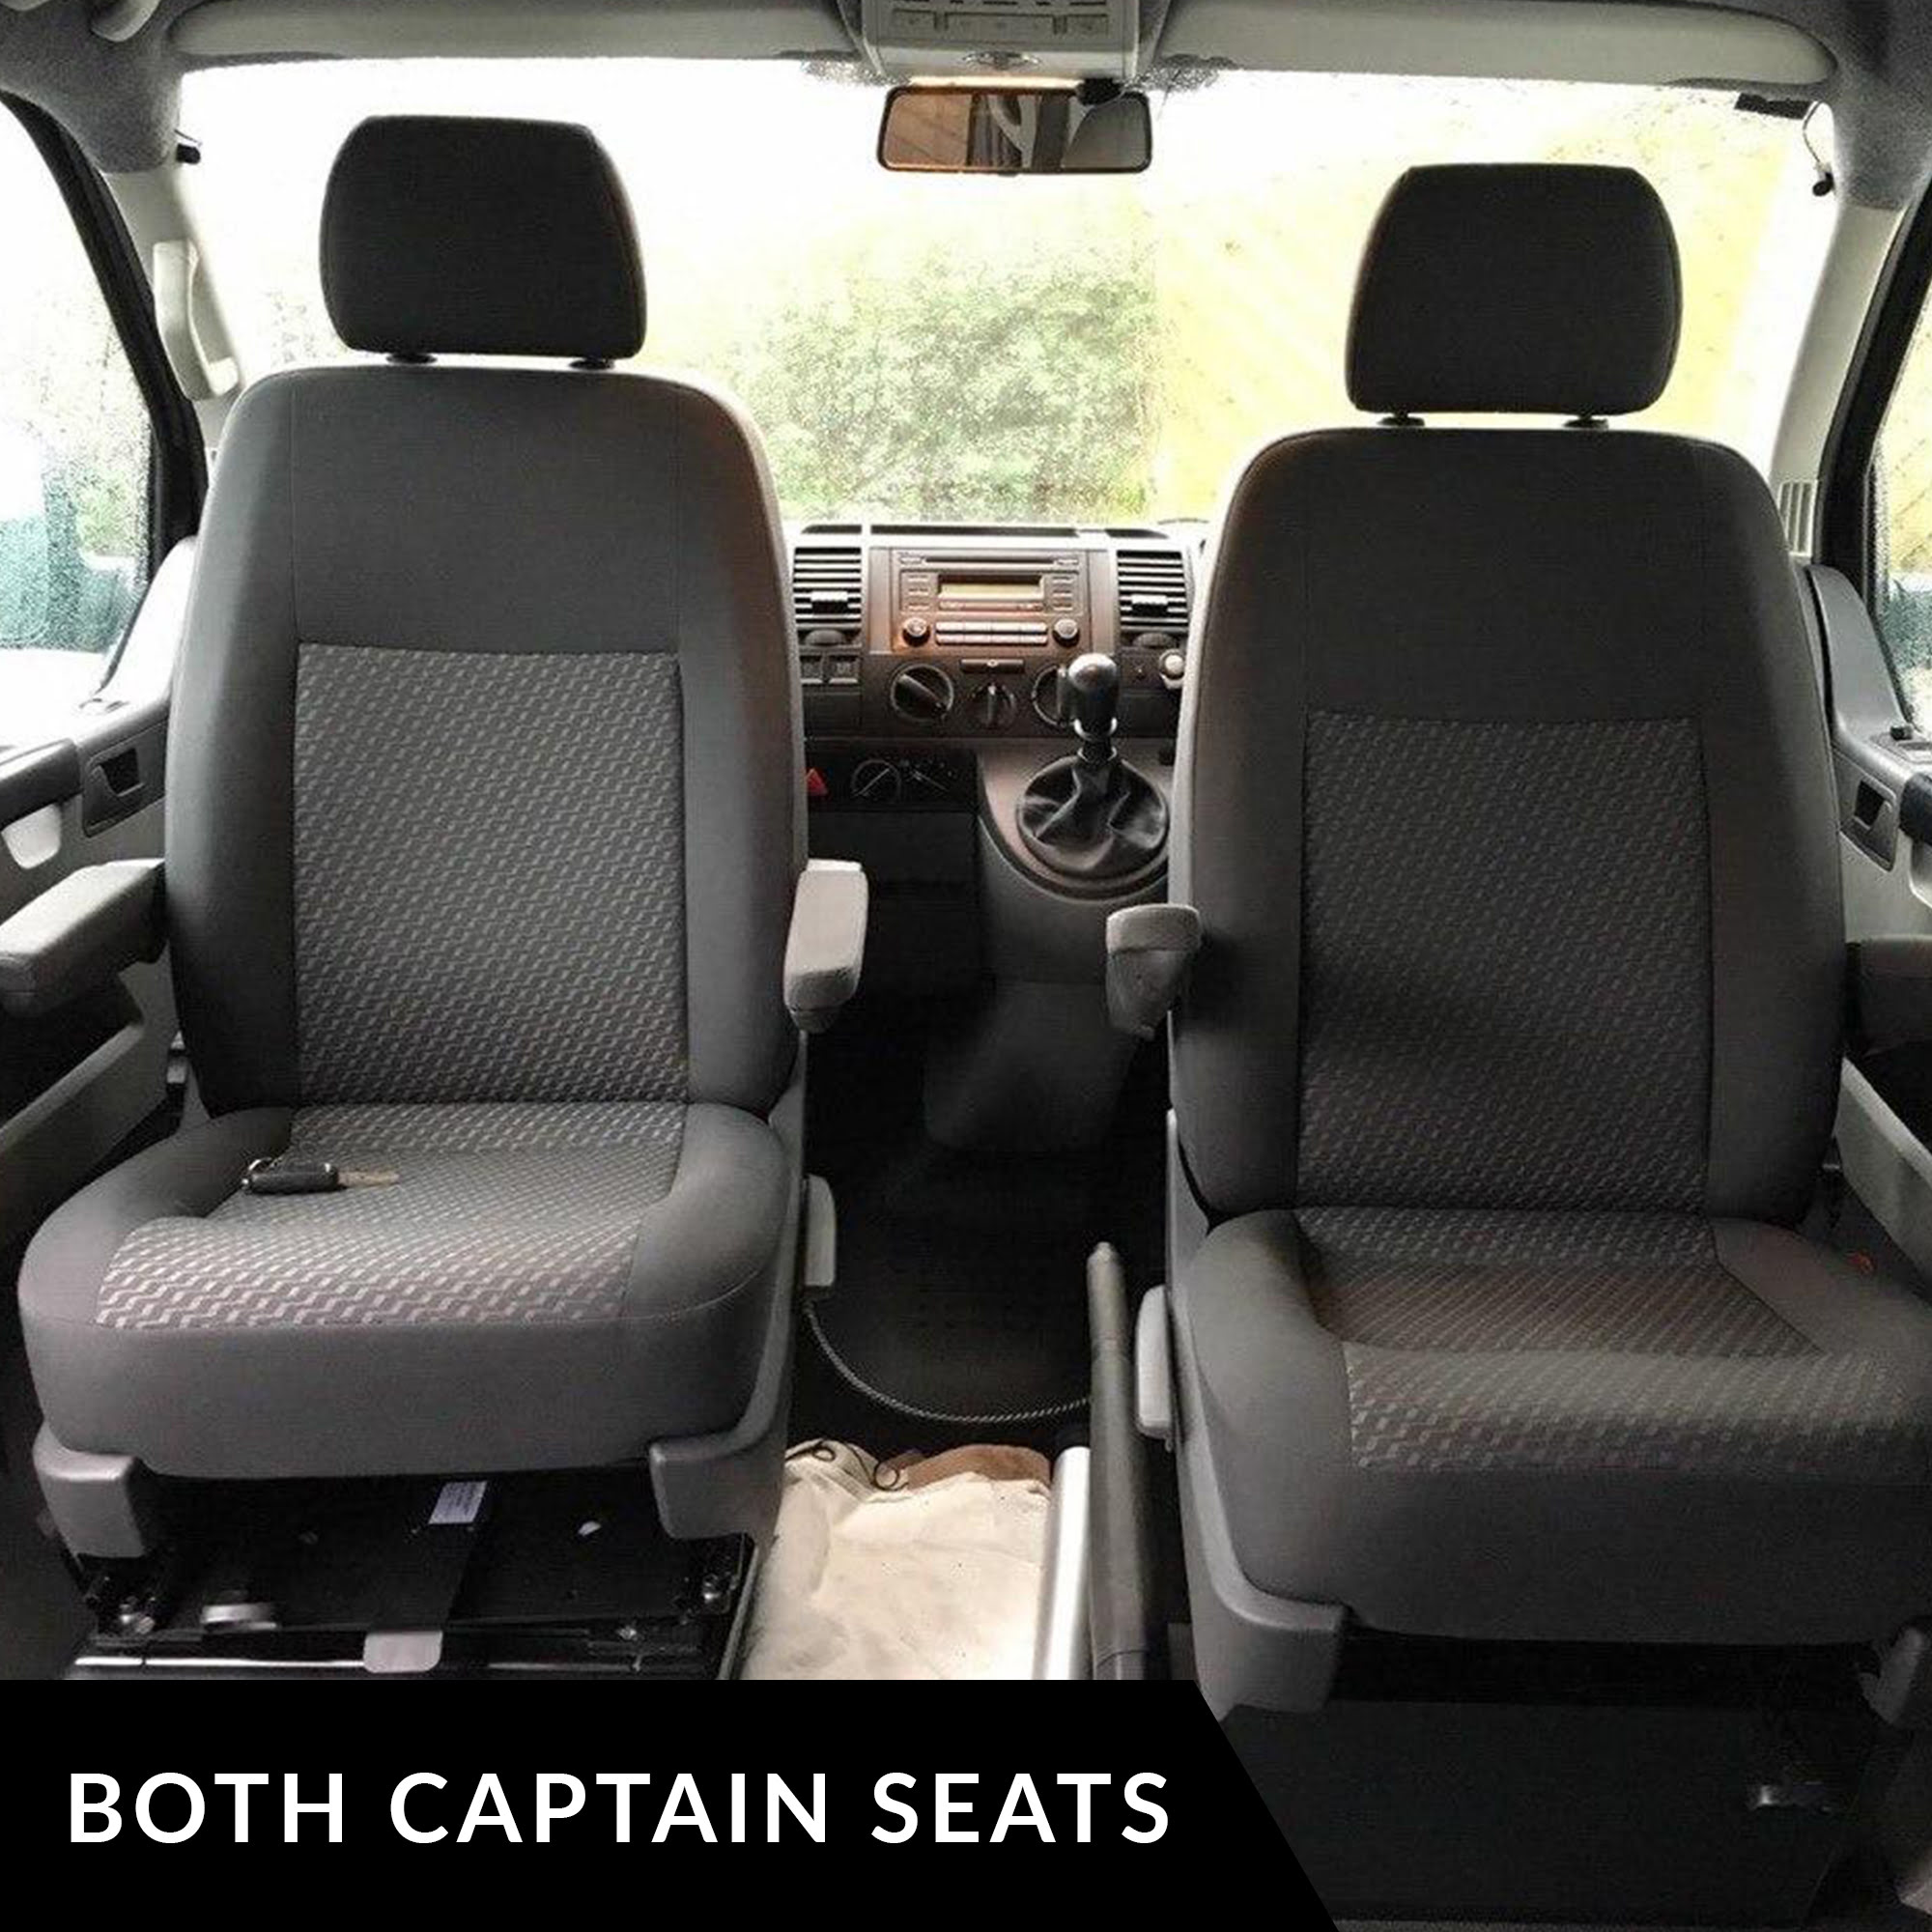 Vw transporter single passenger seat